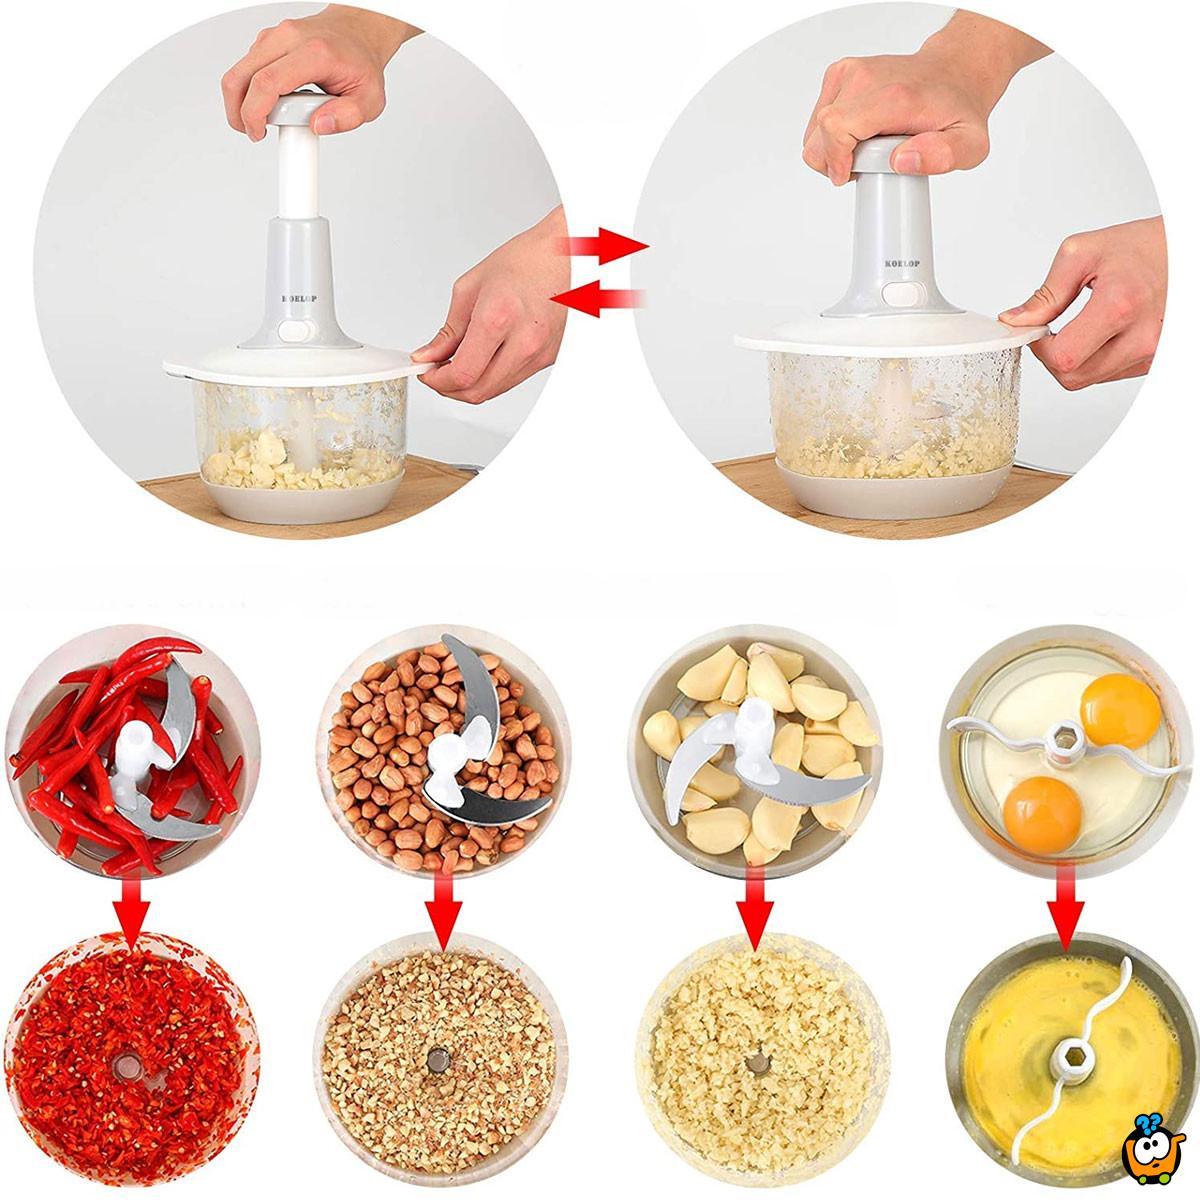 Twist and cut - Ručni secko i pasir hrane